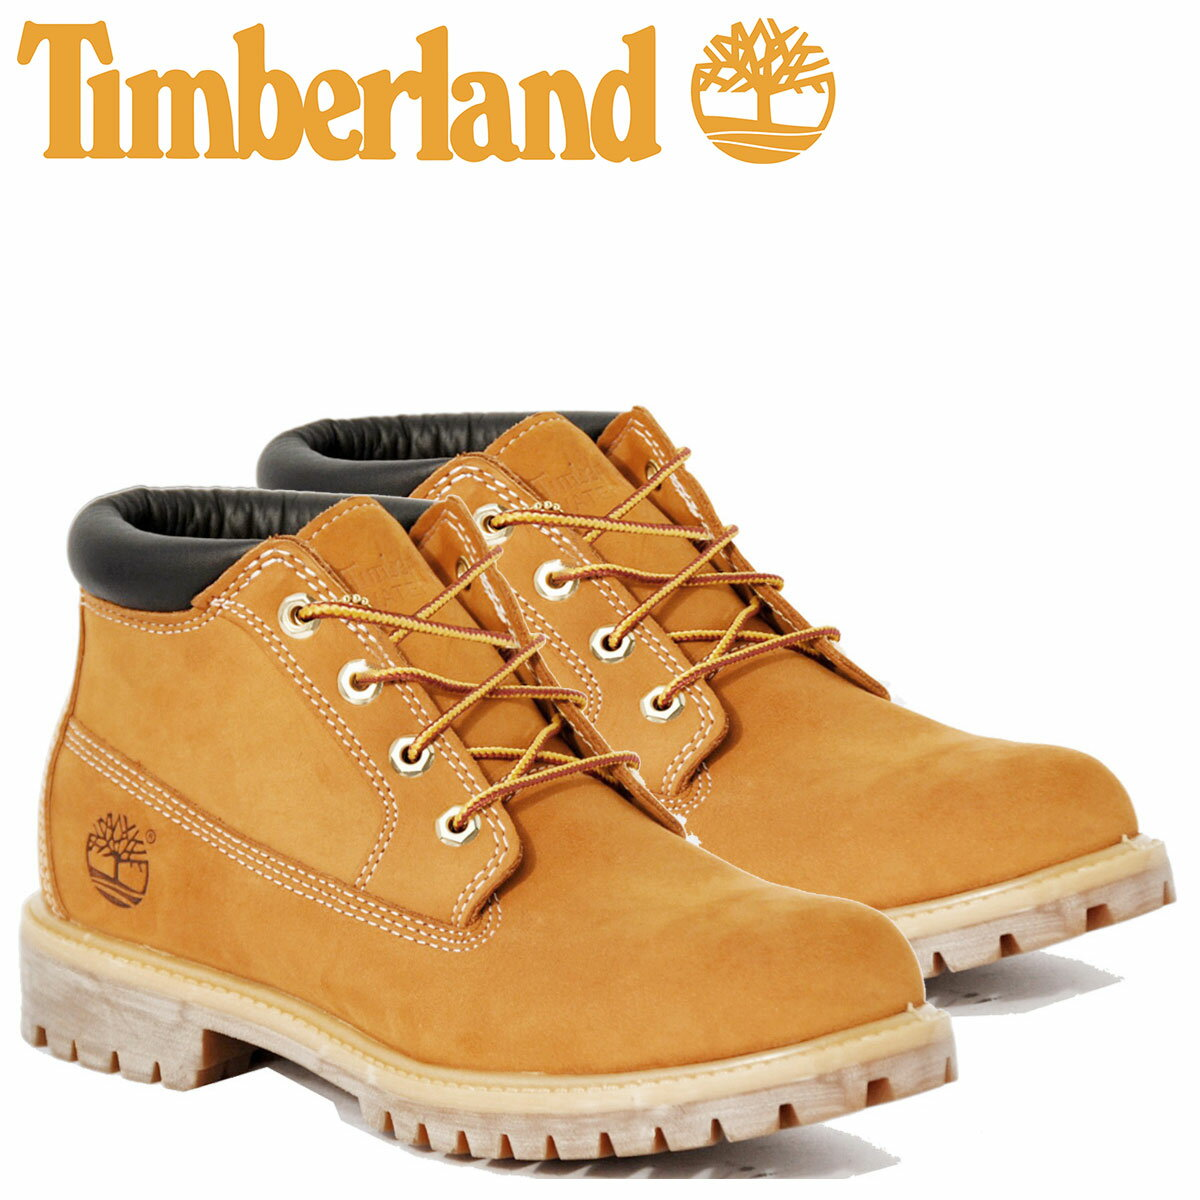 Timberland ブーツ チャッカ メンズ ティンバーランド WATERPROOF CHUKKA BOOT 23061 Wワイズ 防水 [予約商品 1/25頃入荷予定 追加入荷]